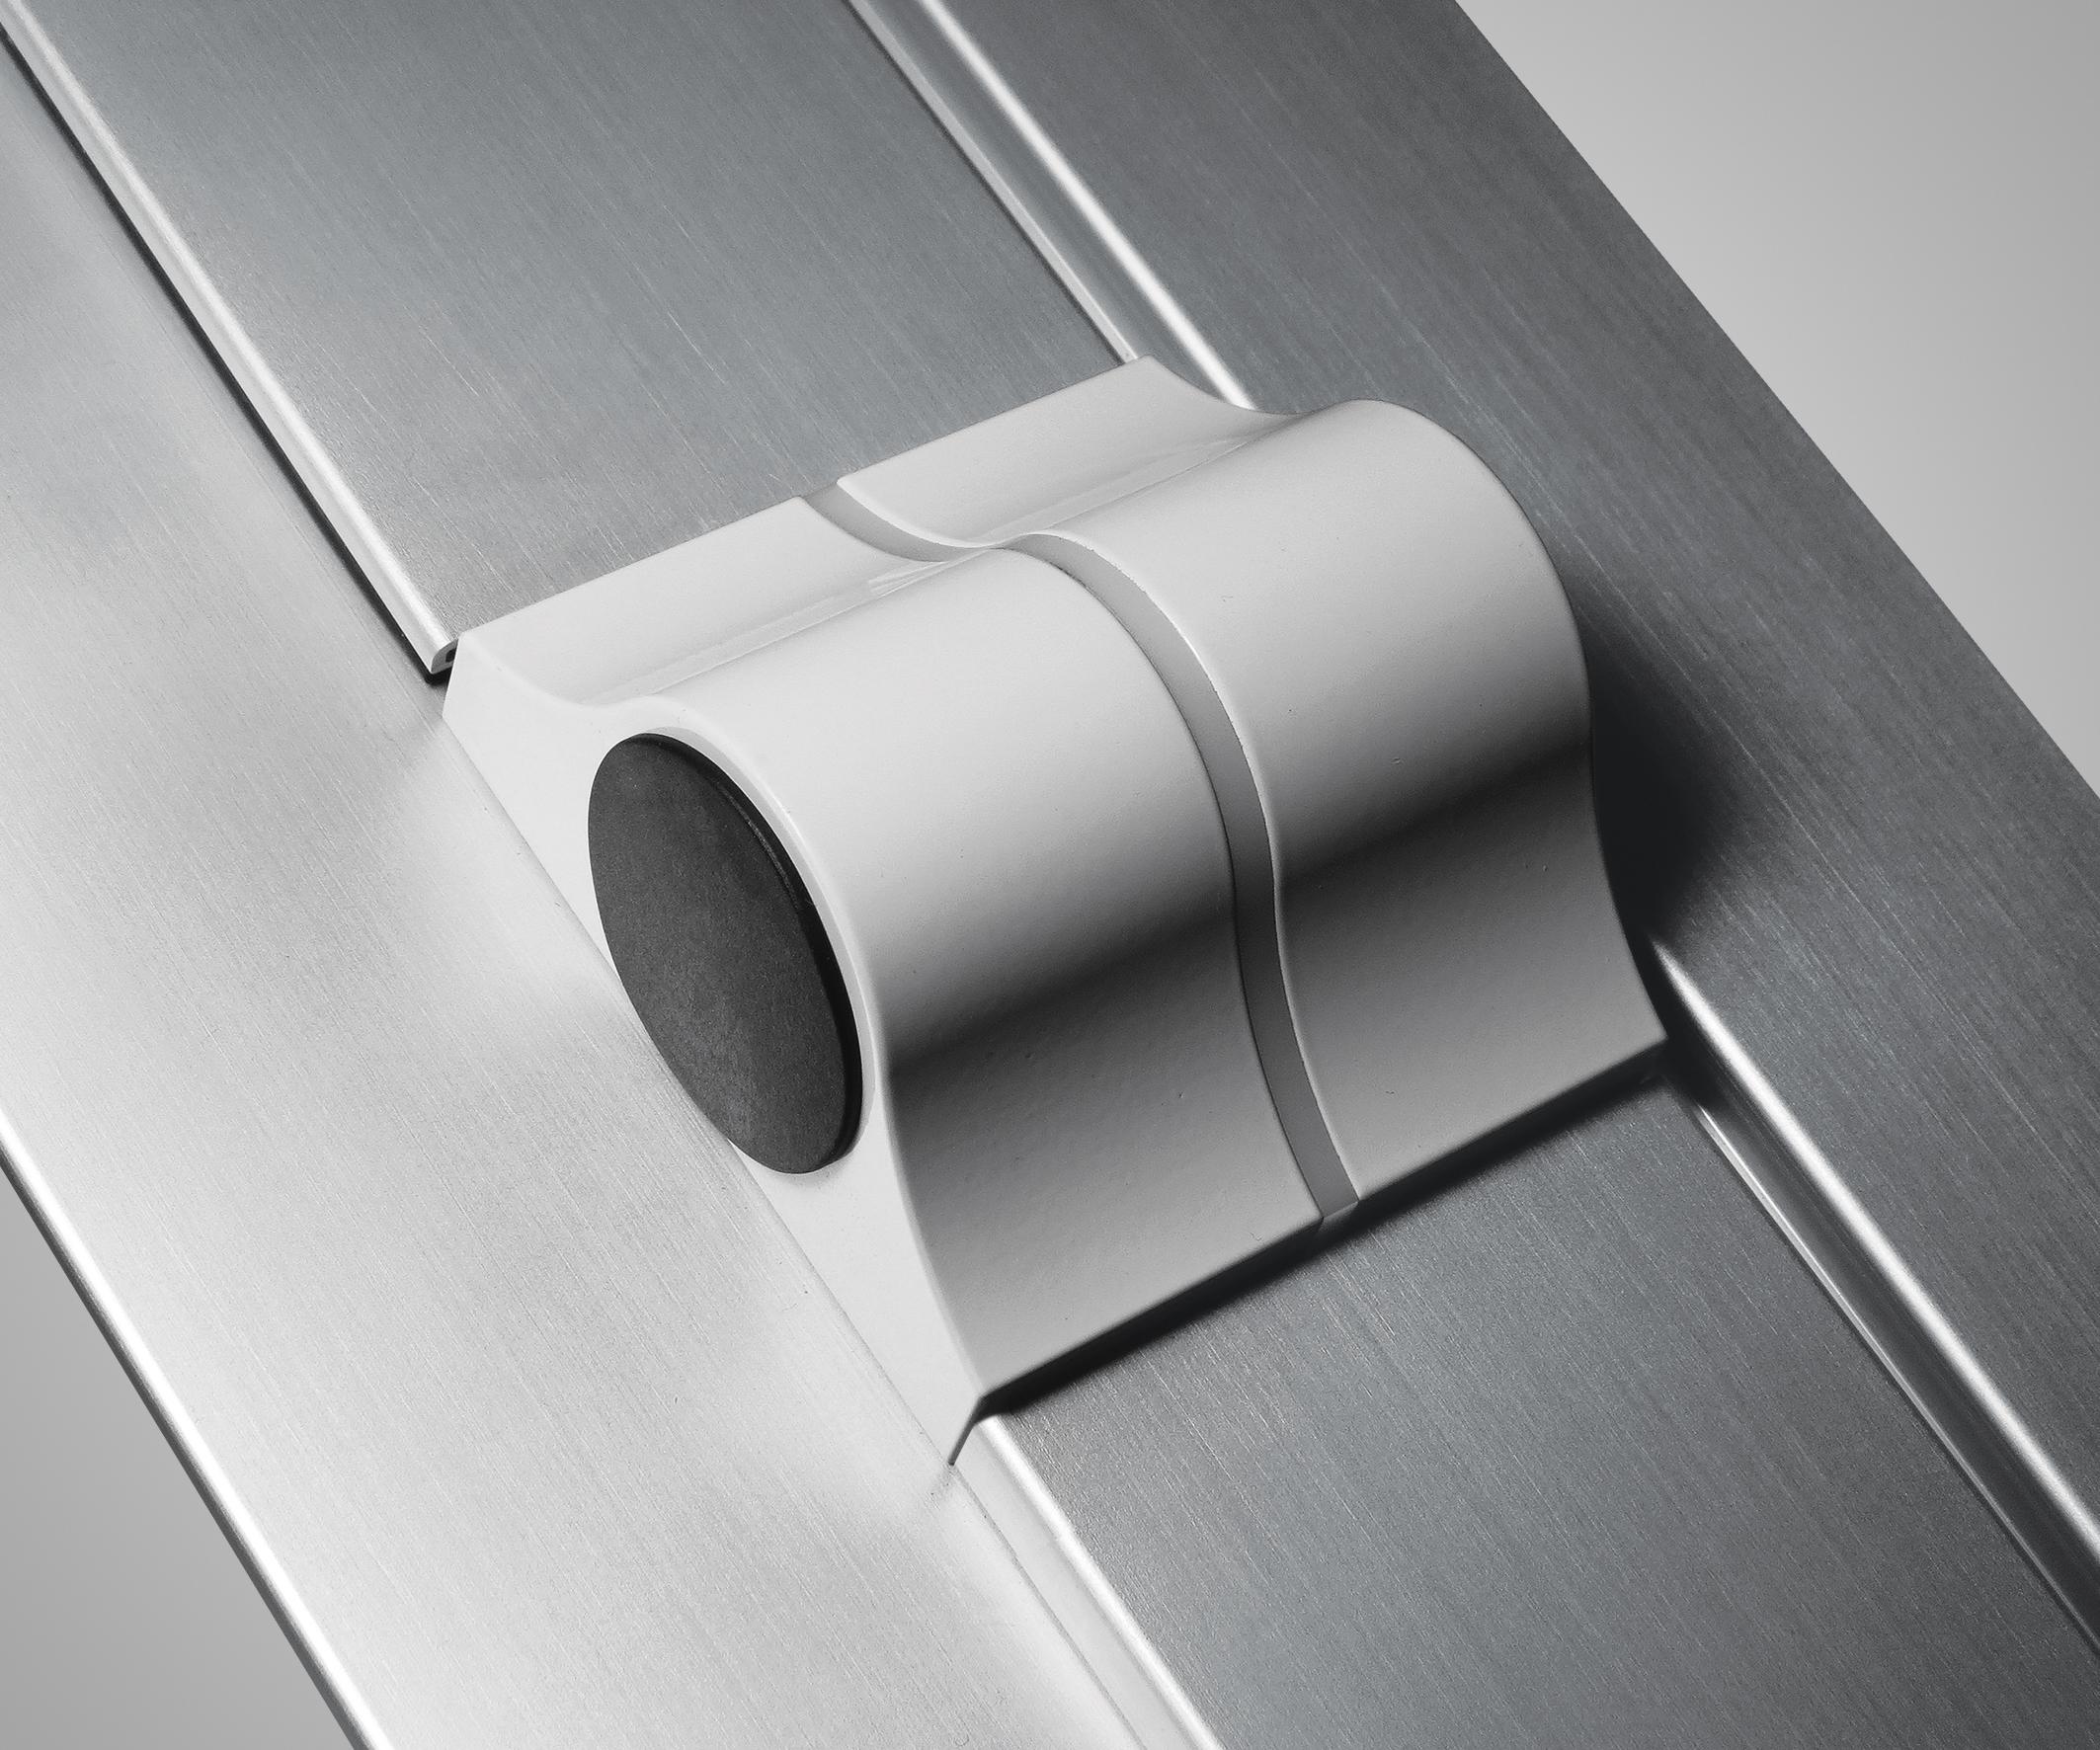 Versatili nuove cerniere a frizione per bilici di grandi dimensioni serramenti design - Finestre a bilico verticale ...